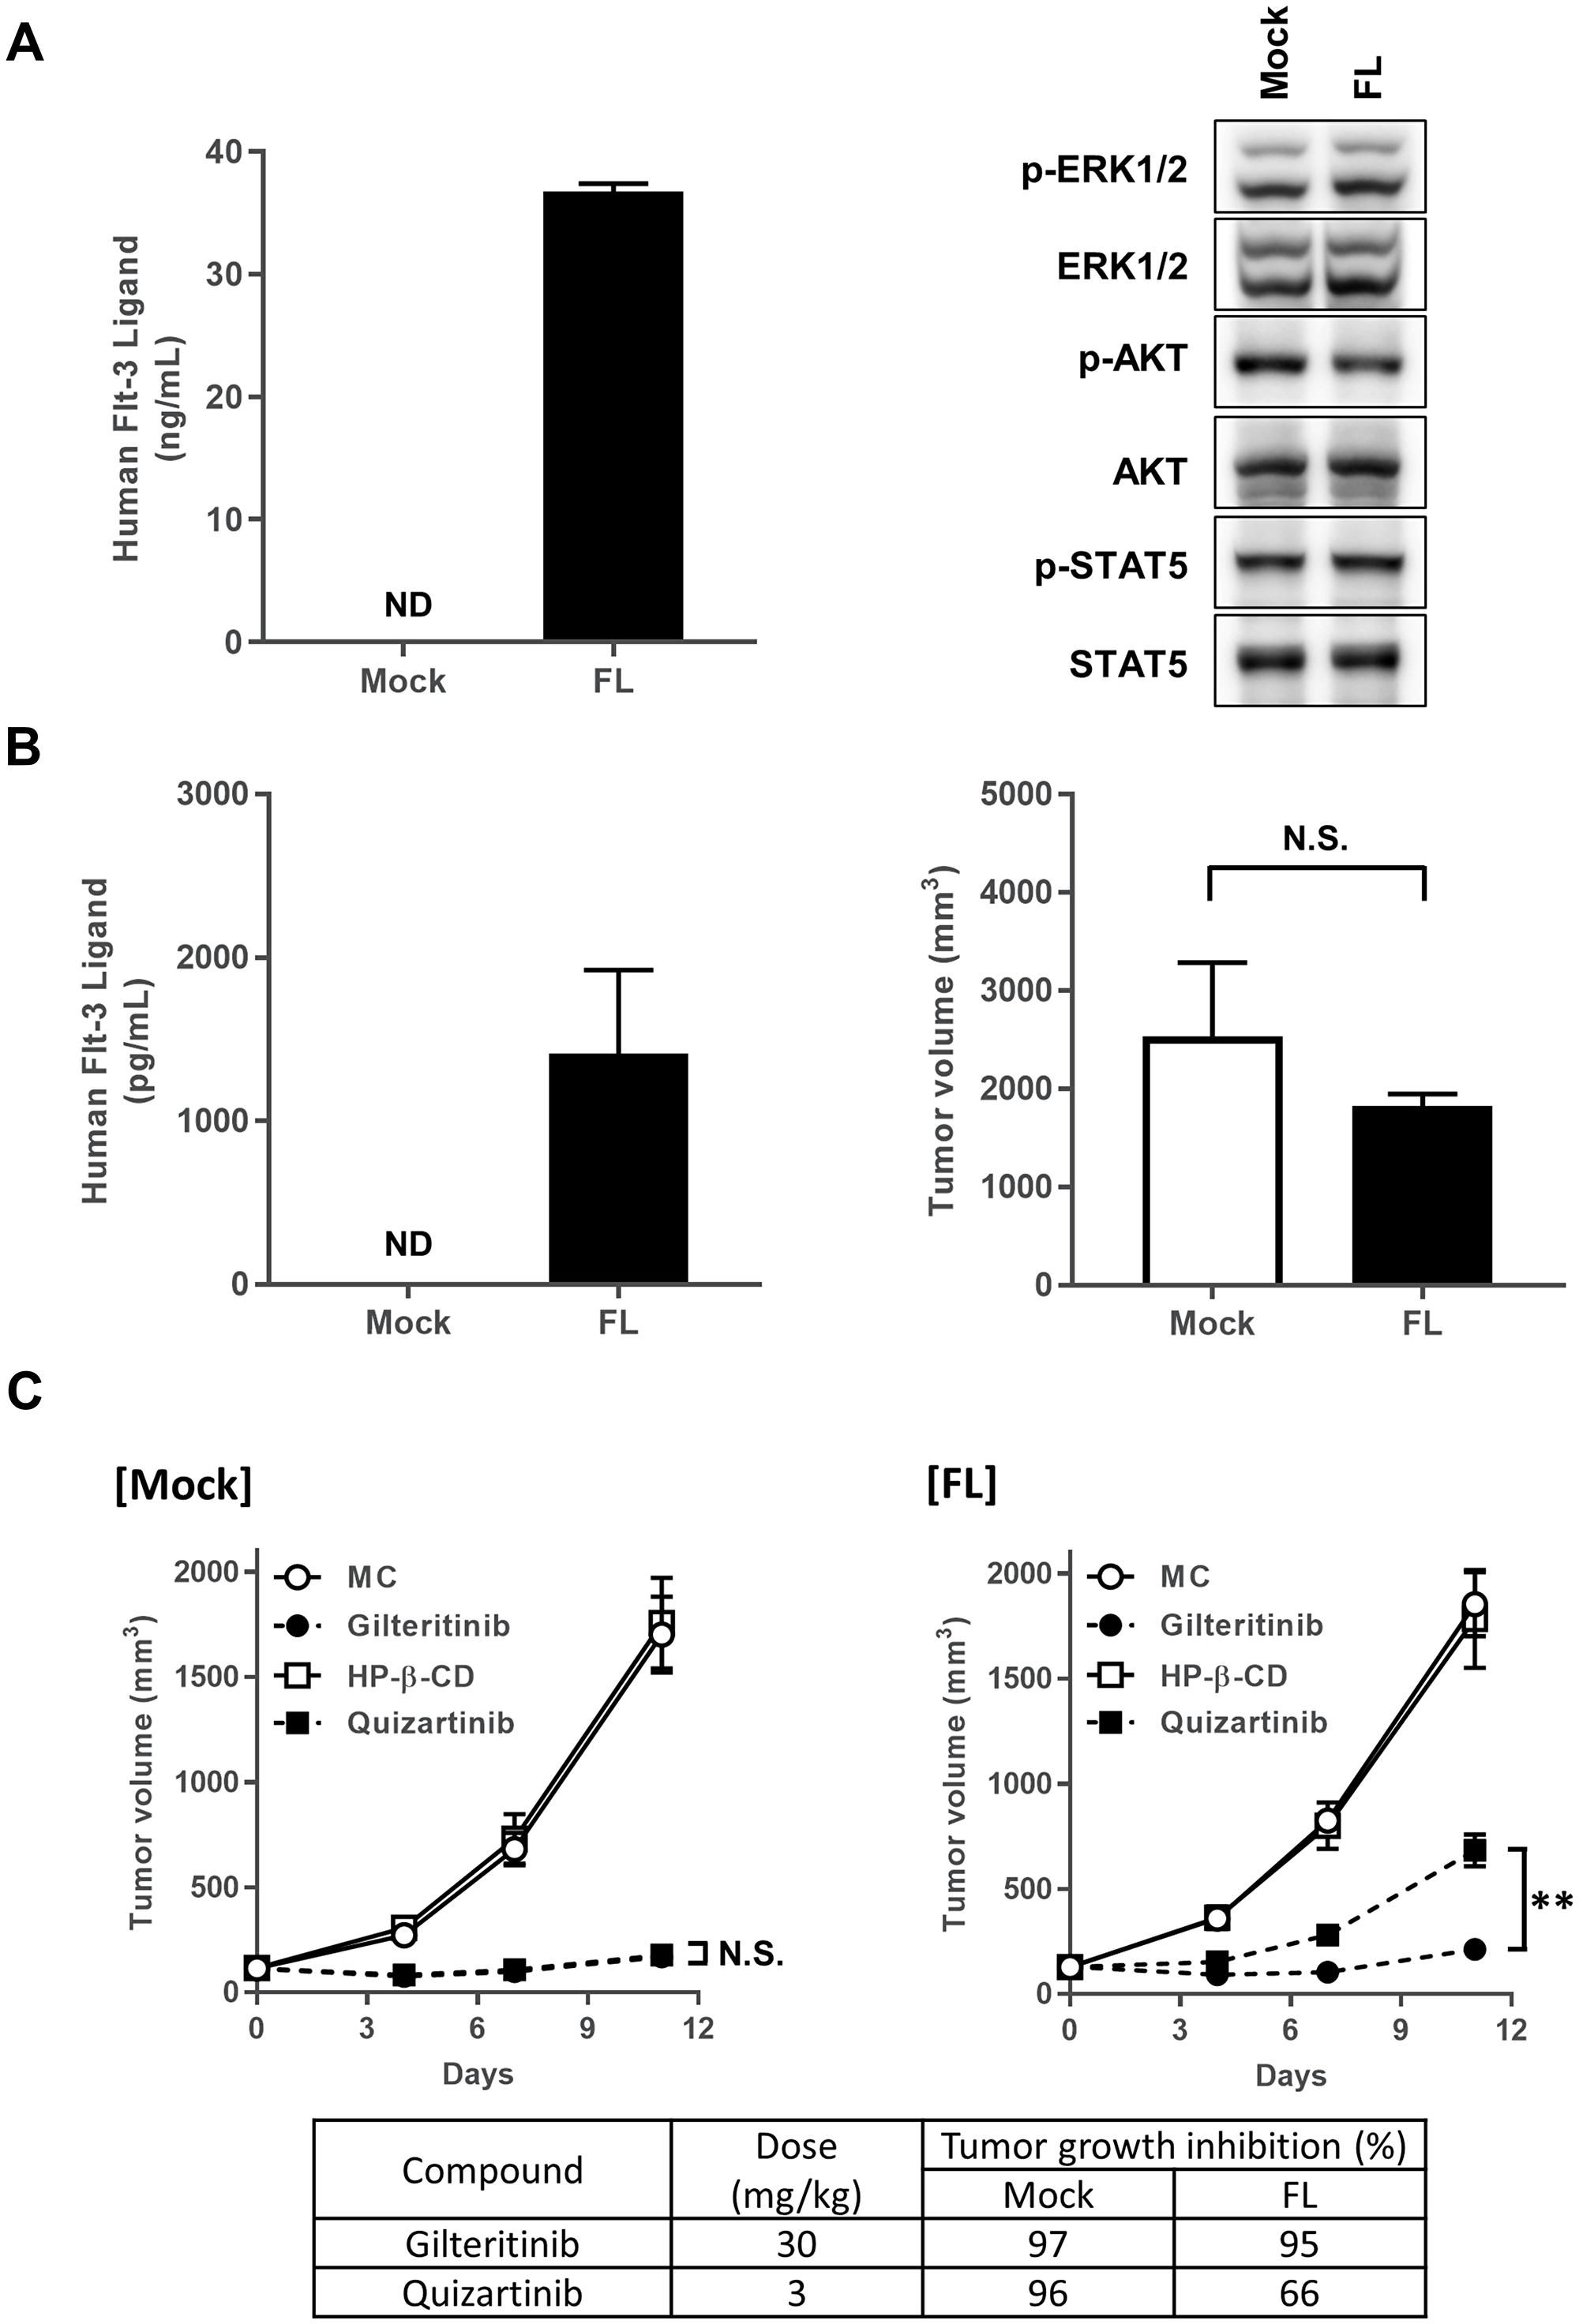 Antitumor efficacy of gilteritinib and quizartinib.